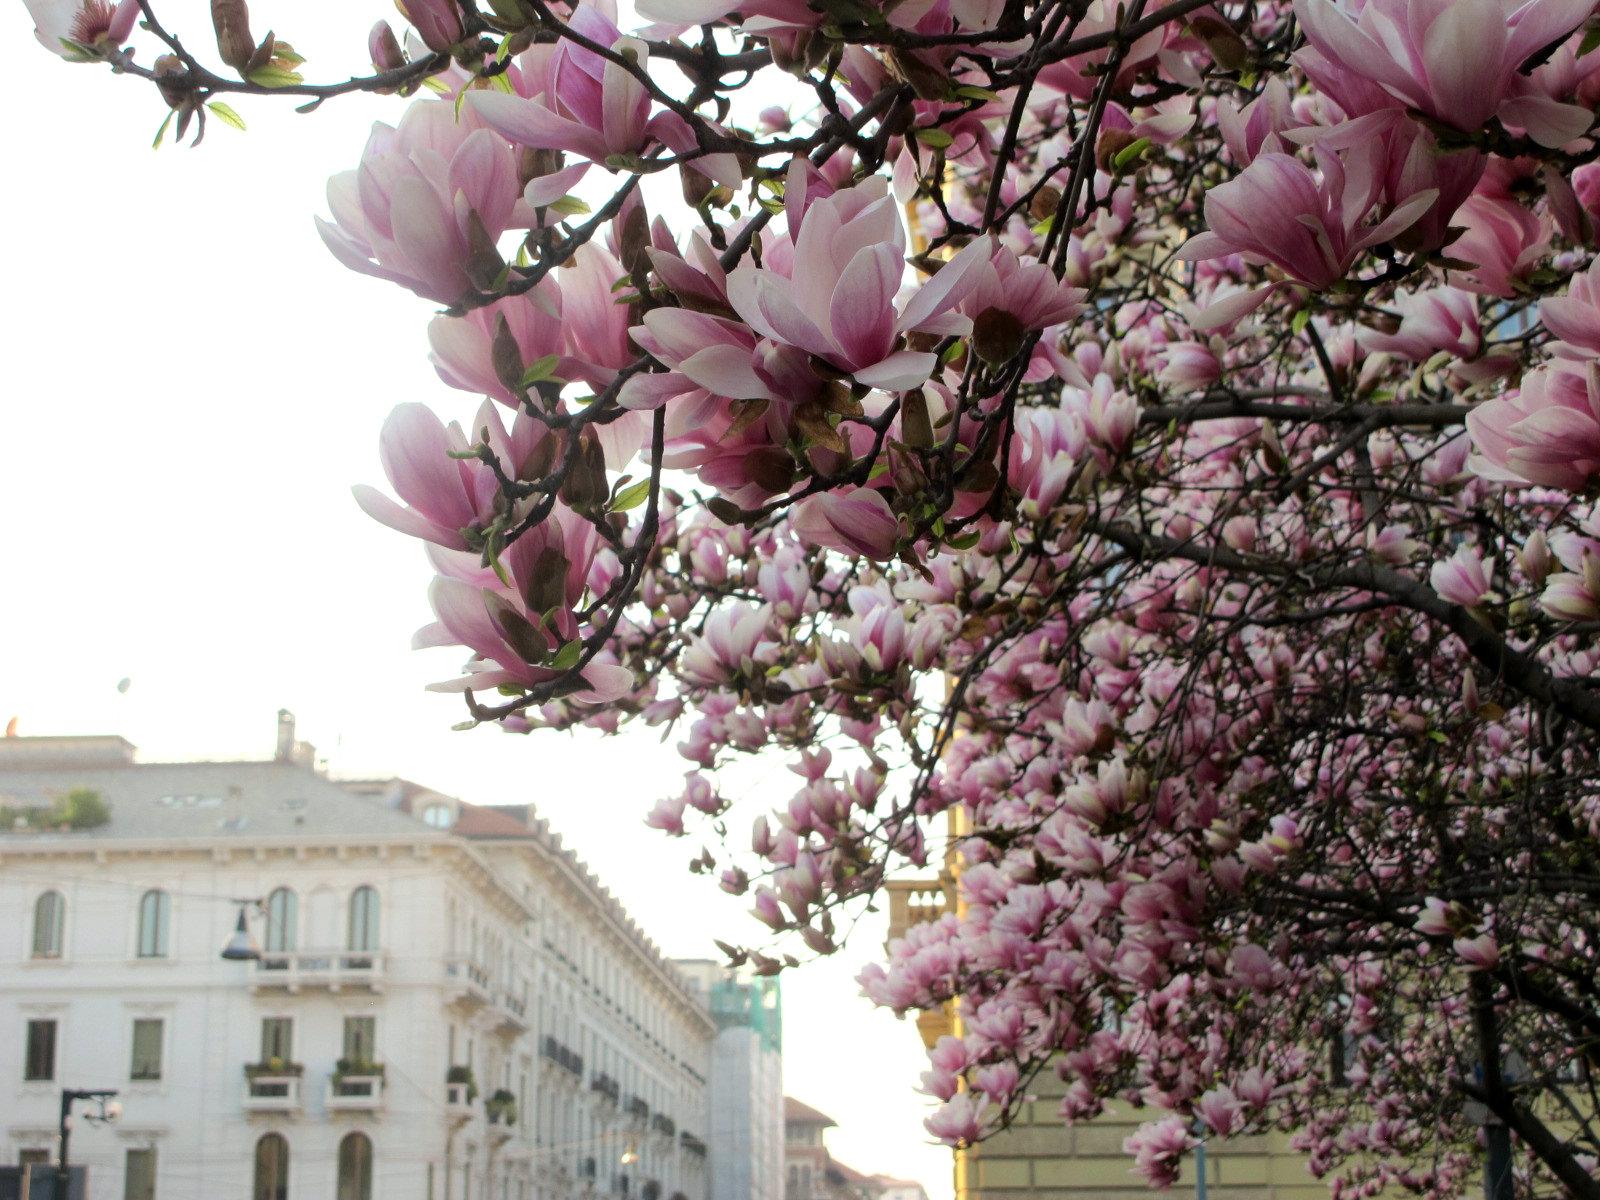 Magnolias en fleurs, magnolias for ever…